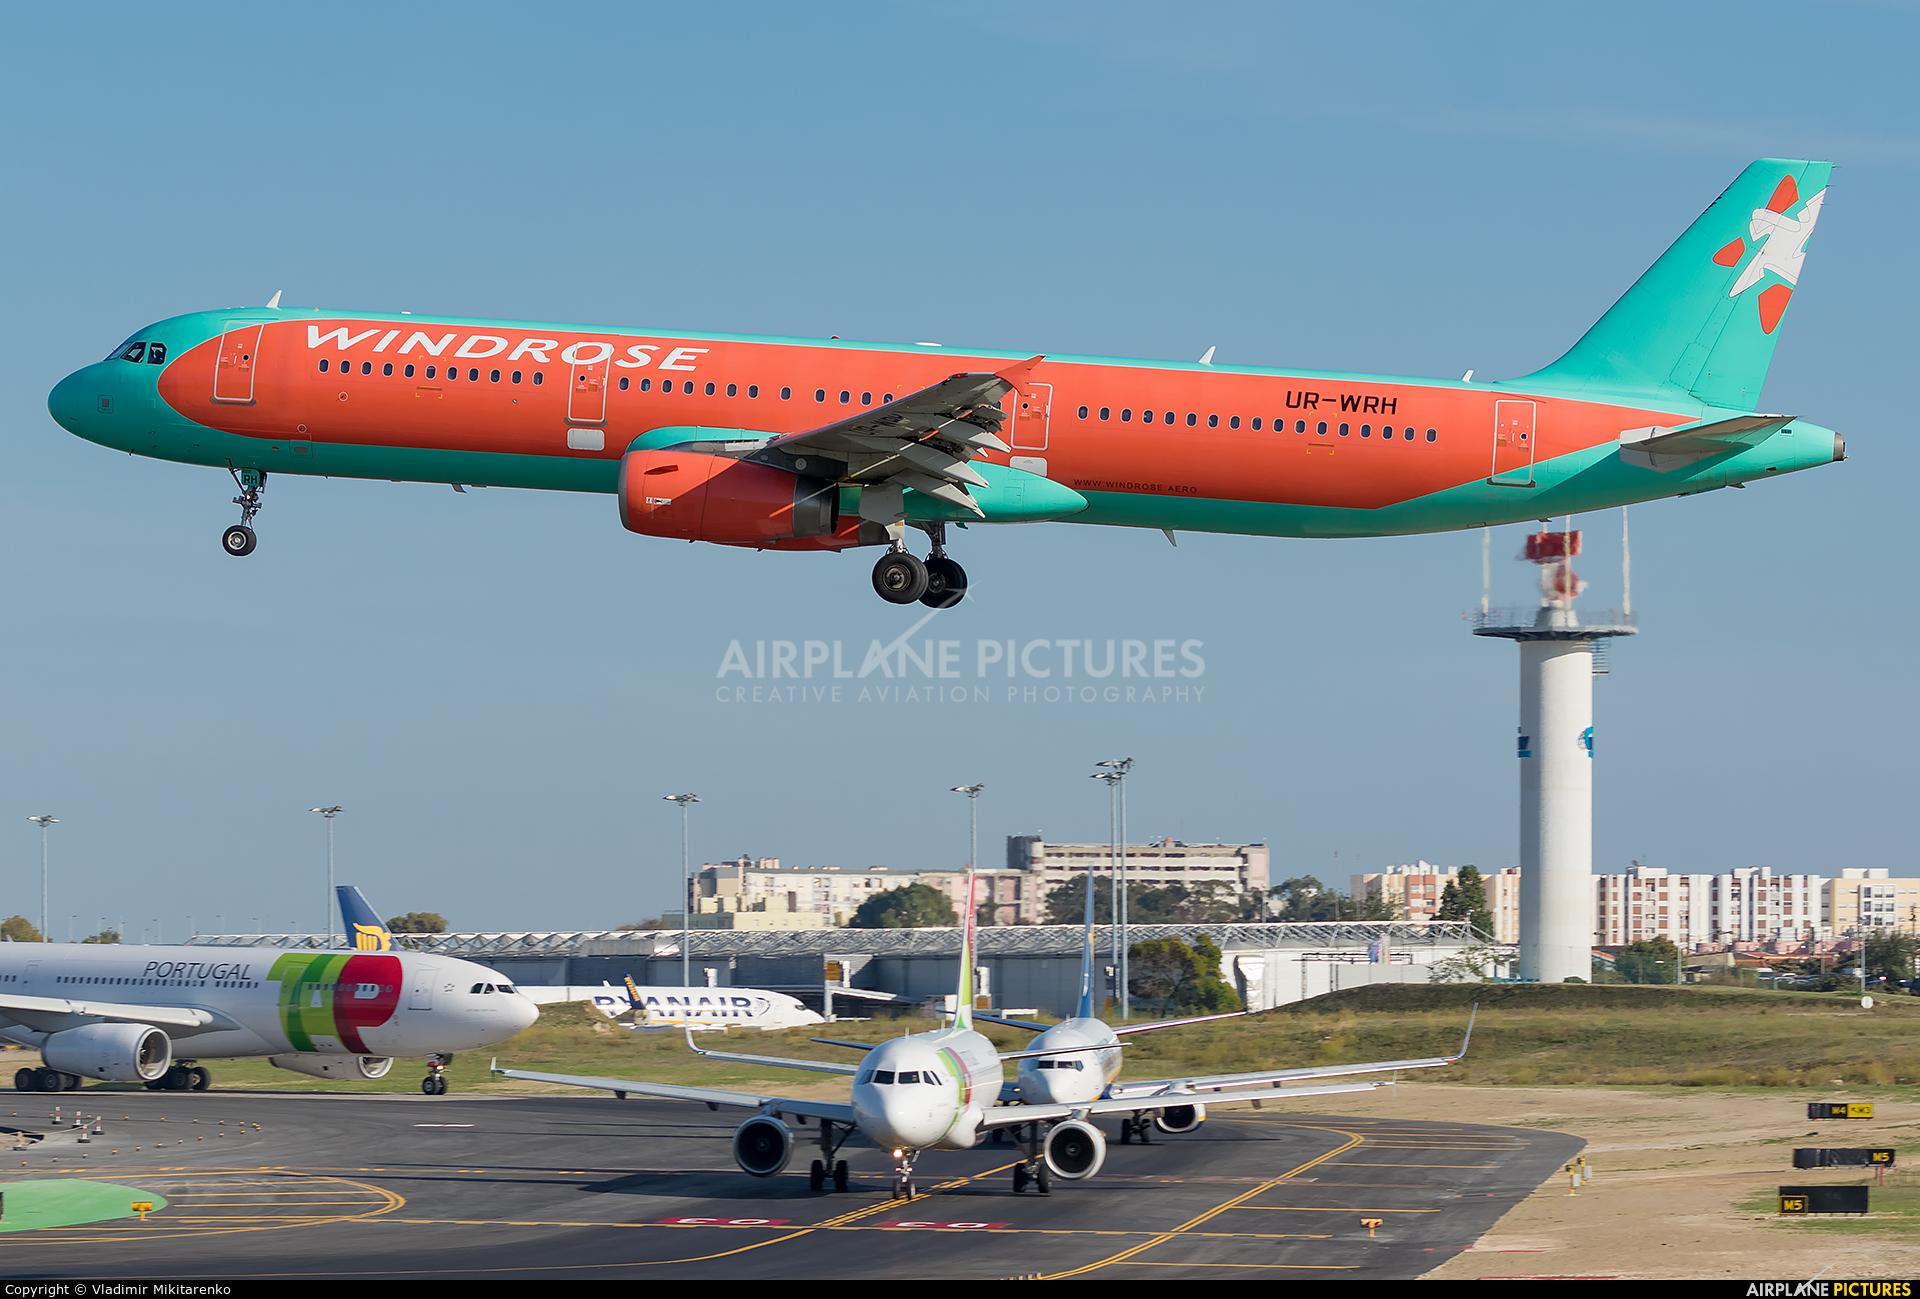 Windrose Air UR-WRH aircraft at Lisbon